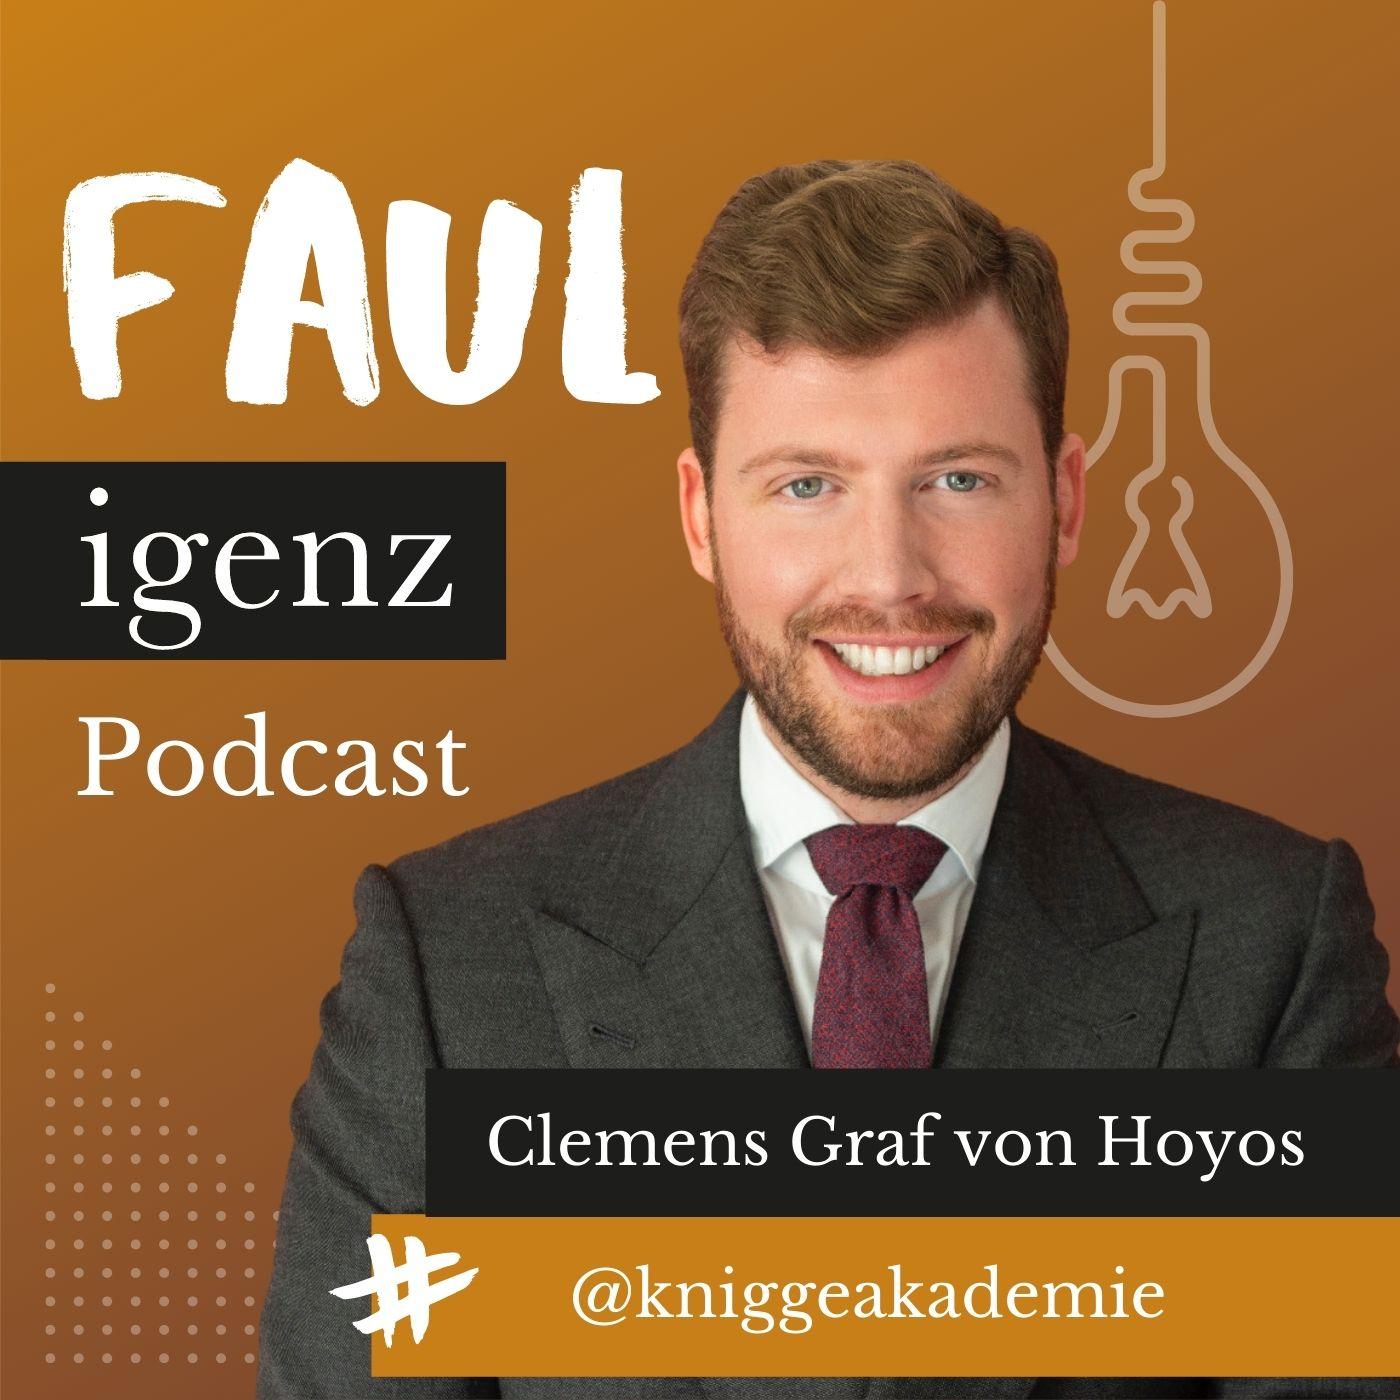 Clemens Graf v. Hoyos – Knigge, Digital & Fauligenz #03